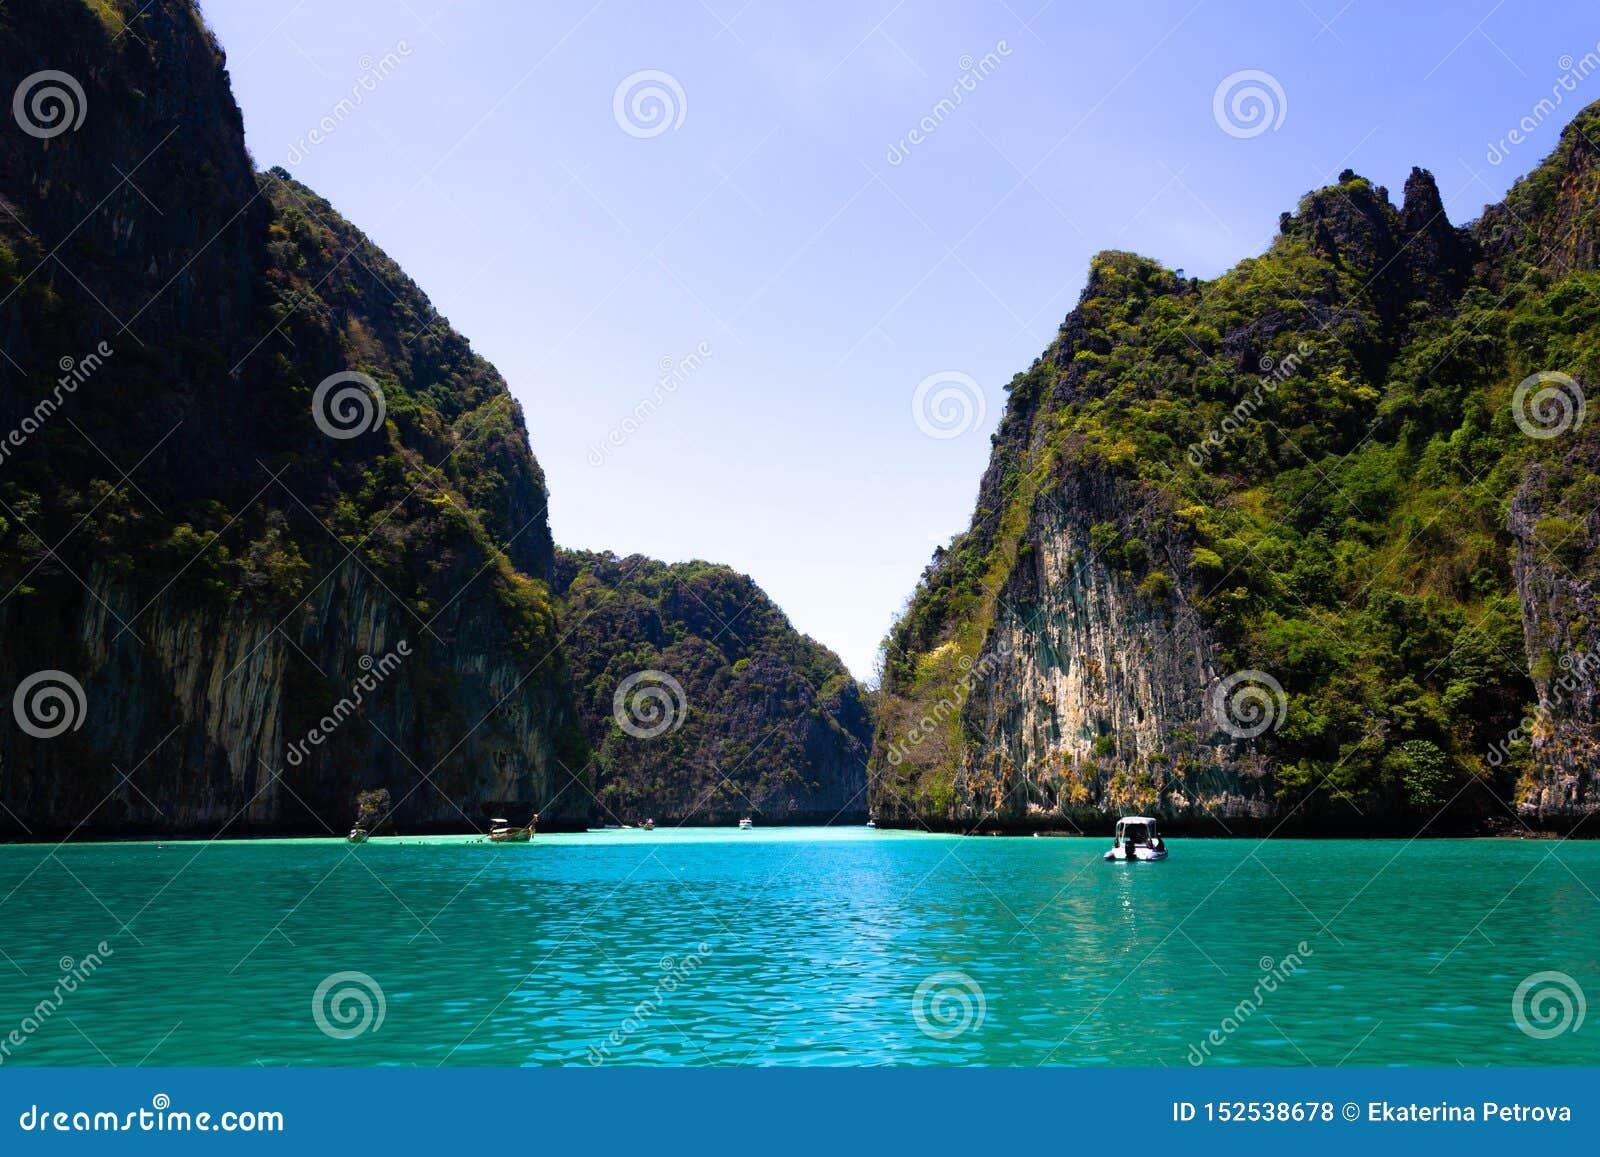 Beach in Krabi province. Vie of Maya Bay, Phi Phi island. Hong islands lagoon. Gray green stone rock on the background of crystal